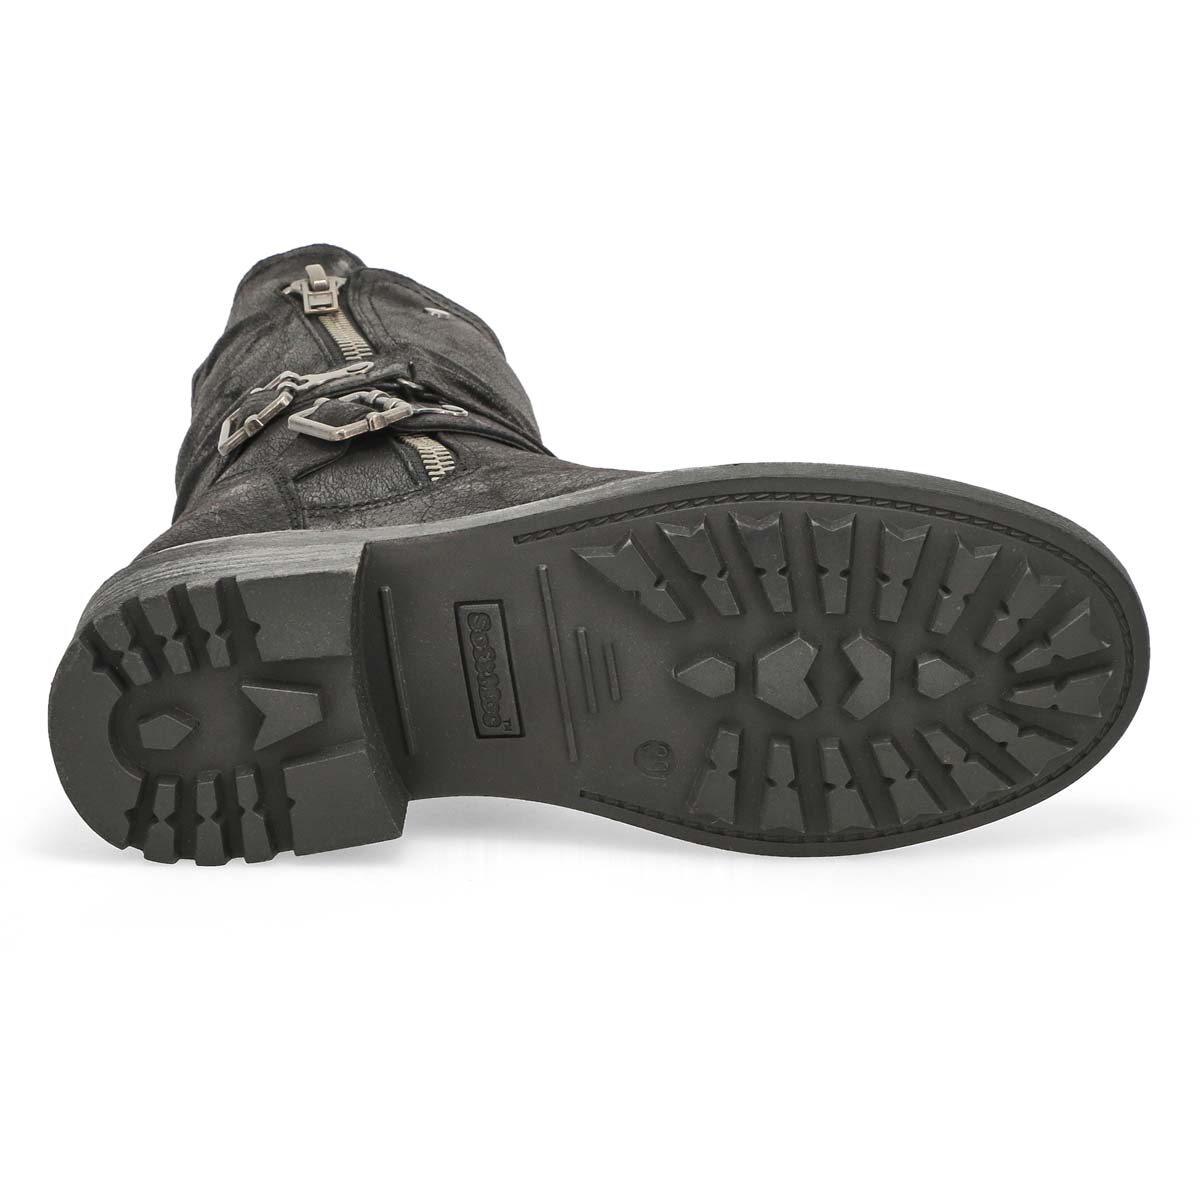 Lds Telina black fur lined combat boot